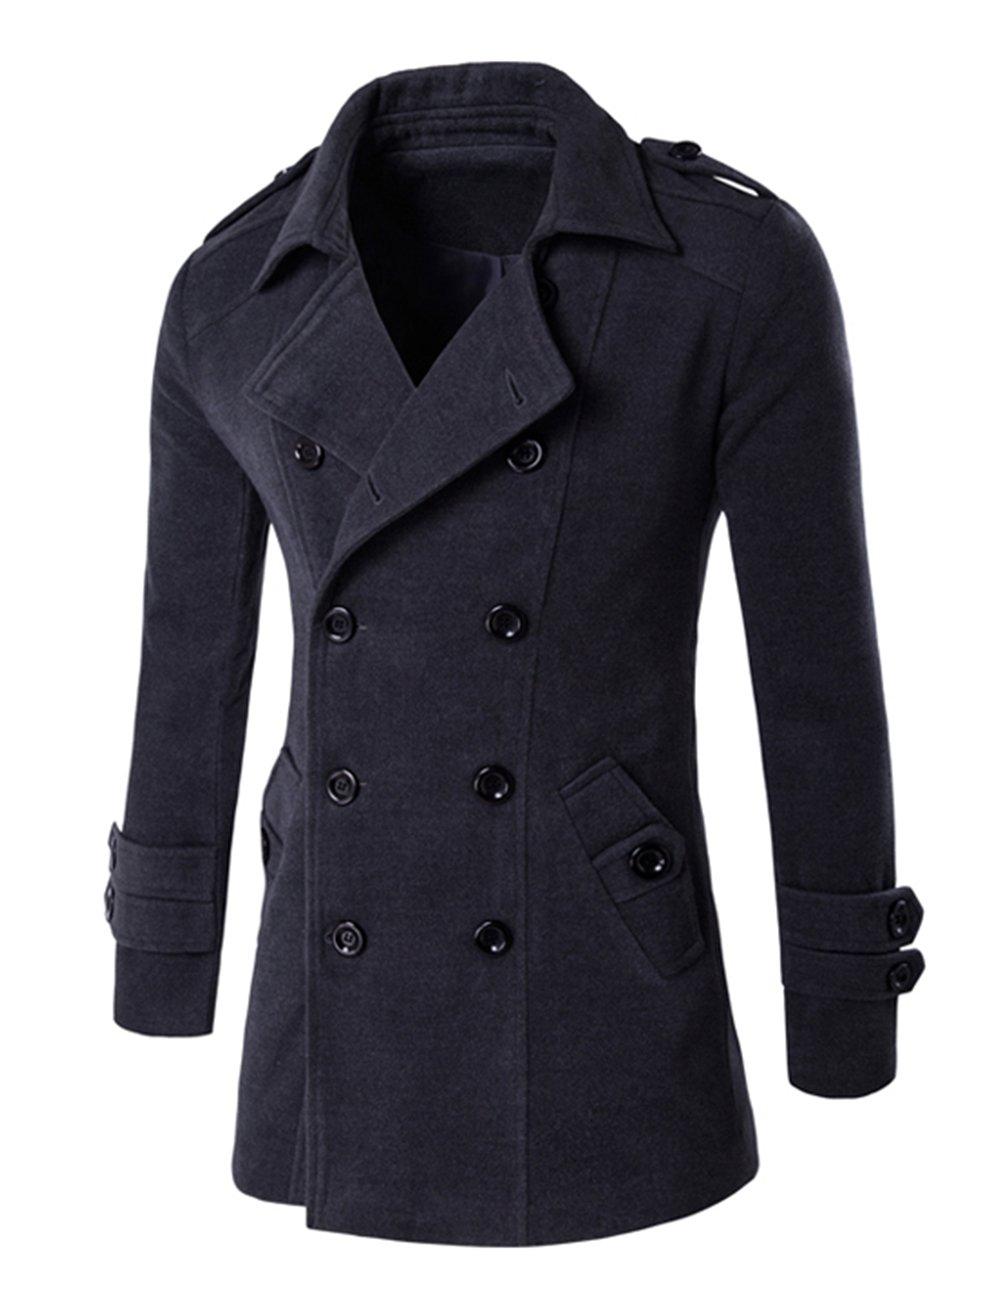 Men's Lapel Collar Dust Coat Stylish Cotton Overcoat with Double Button Wind Coat